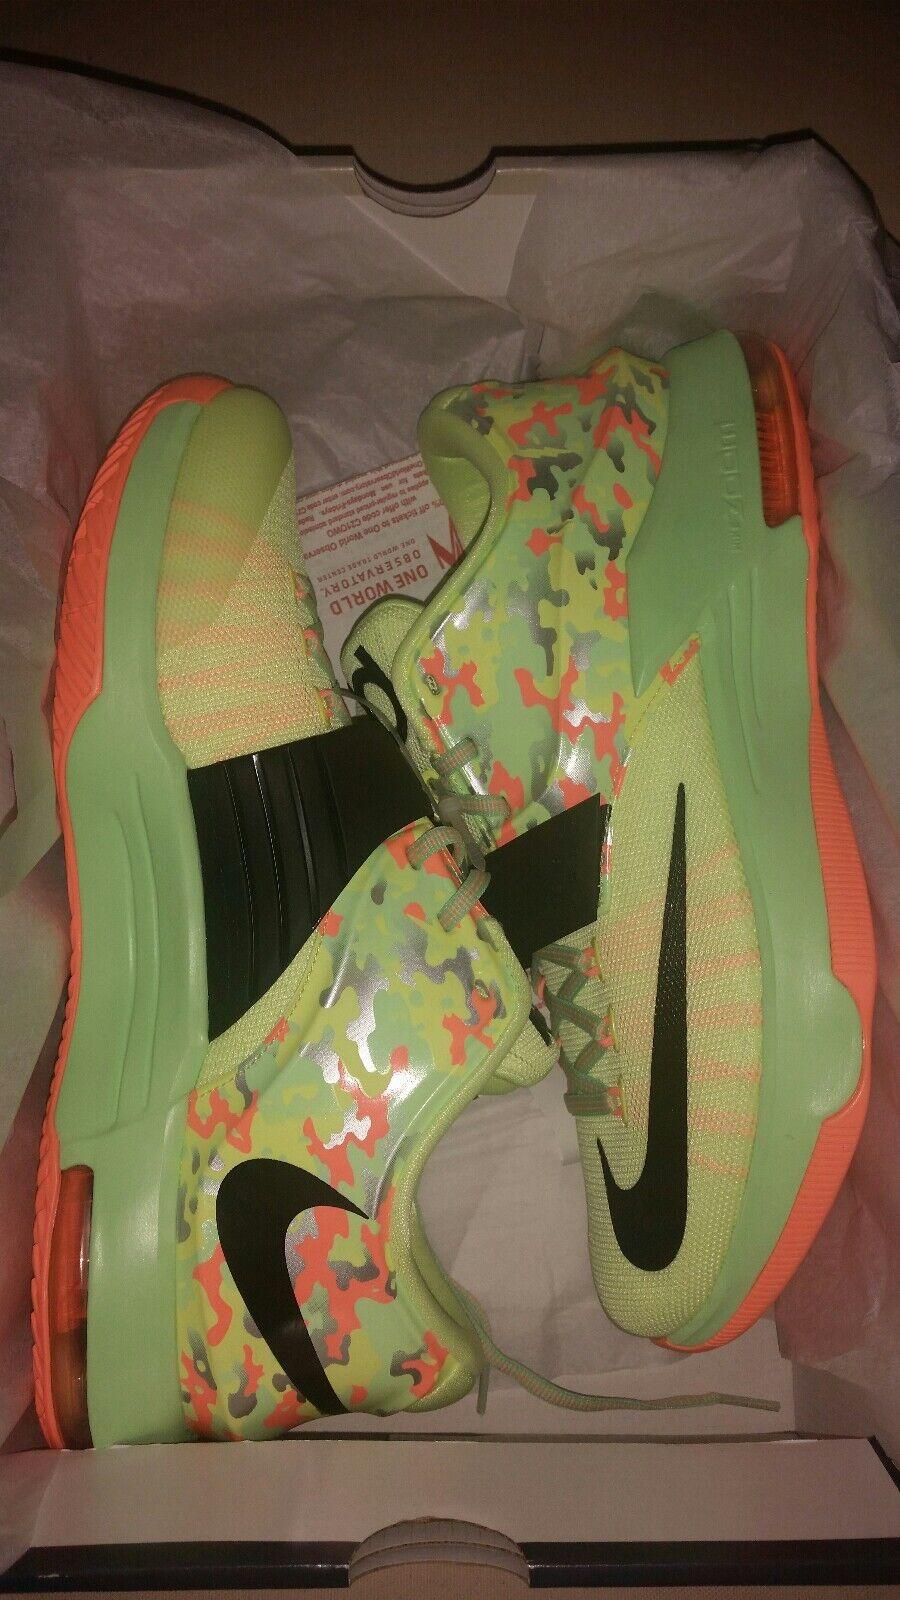 Nike Air KD 7 VII Basketball Sneaker South Beach Camo Kevin Durant Trainer shoes